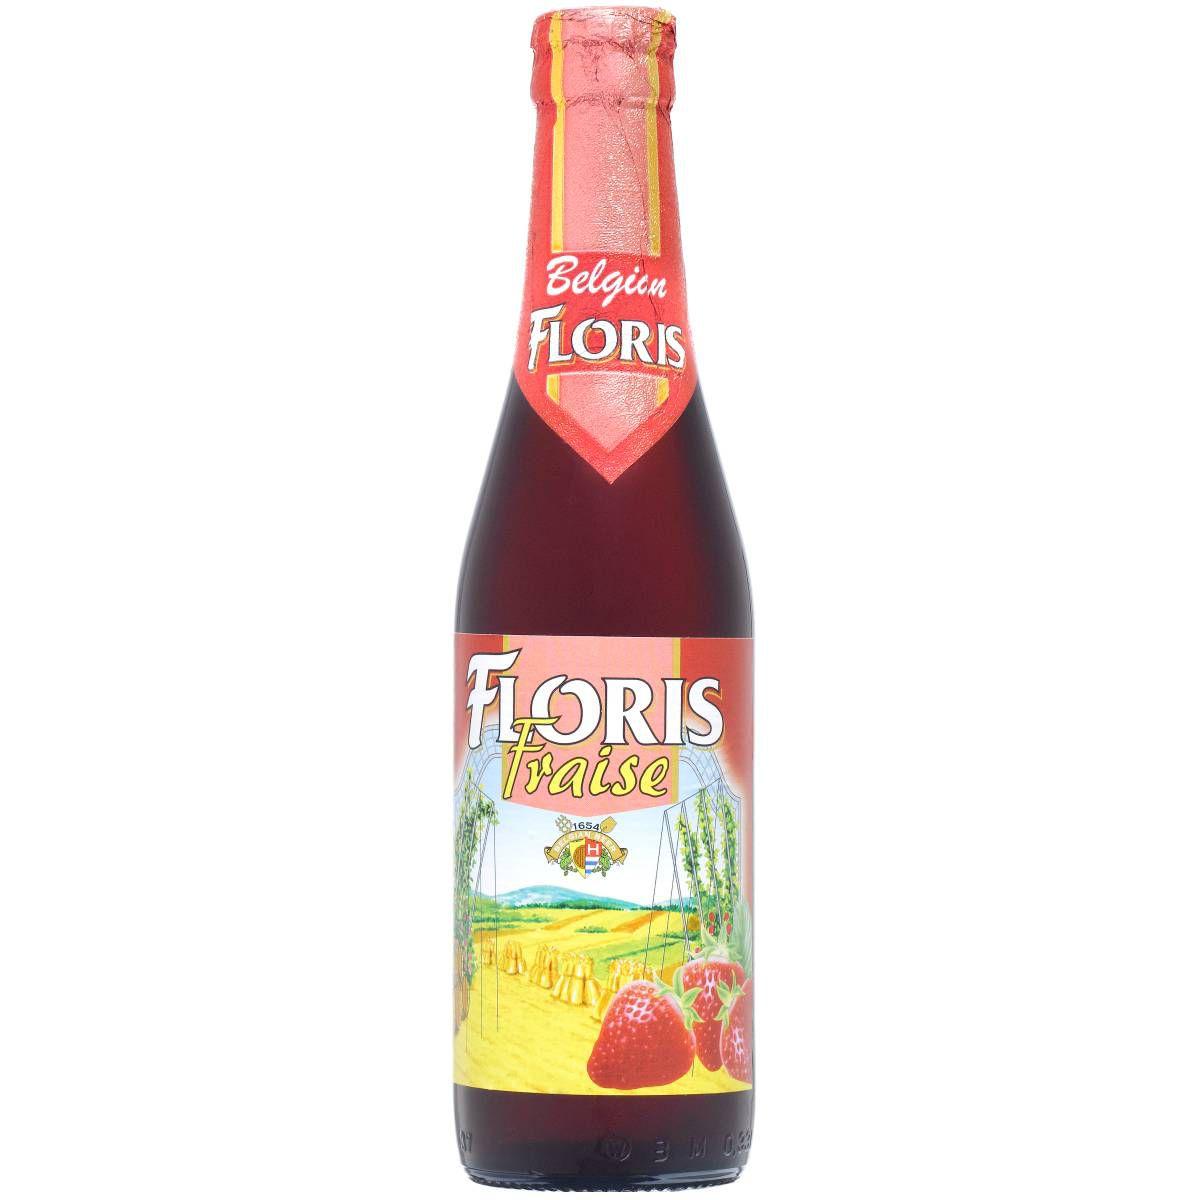 Floris Fraise 330ml